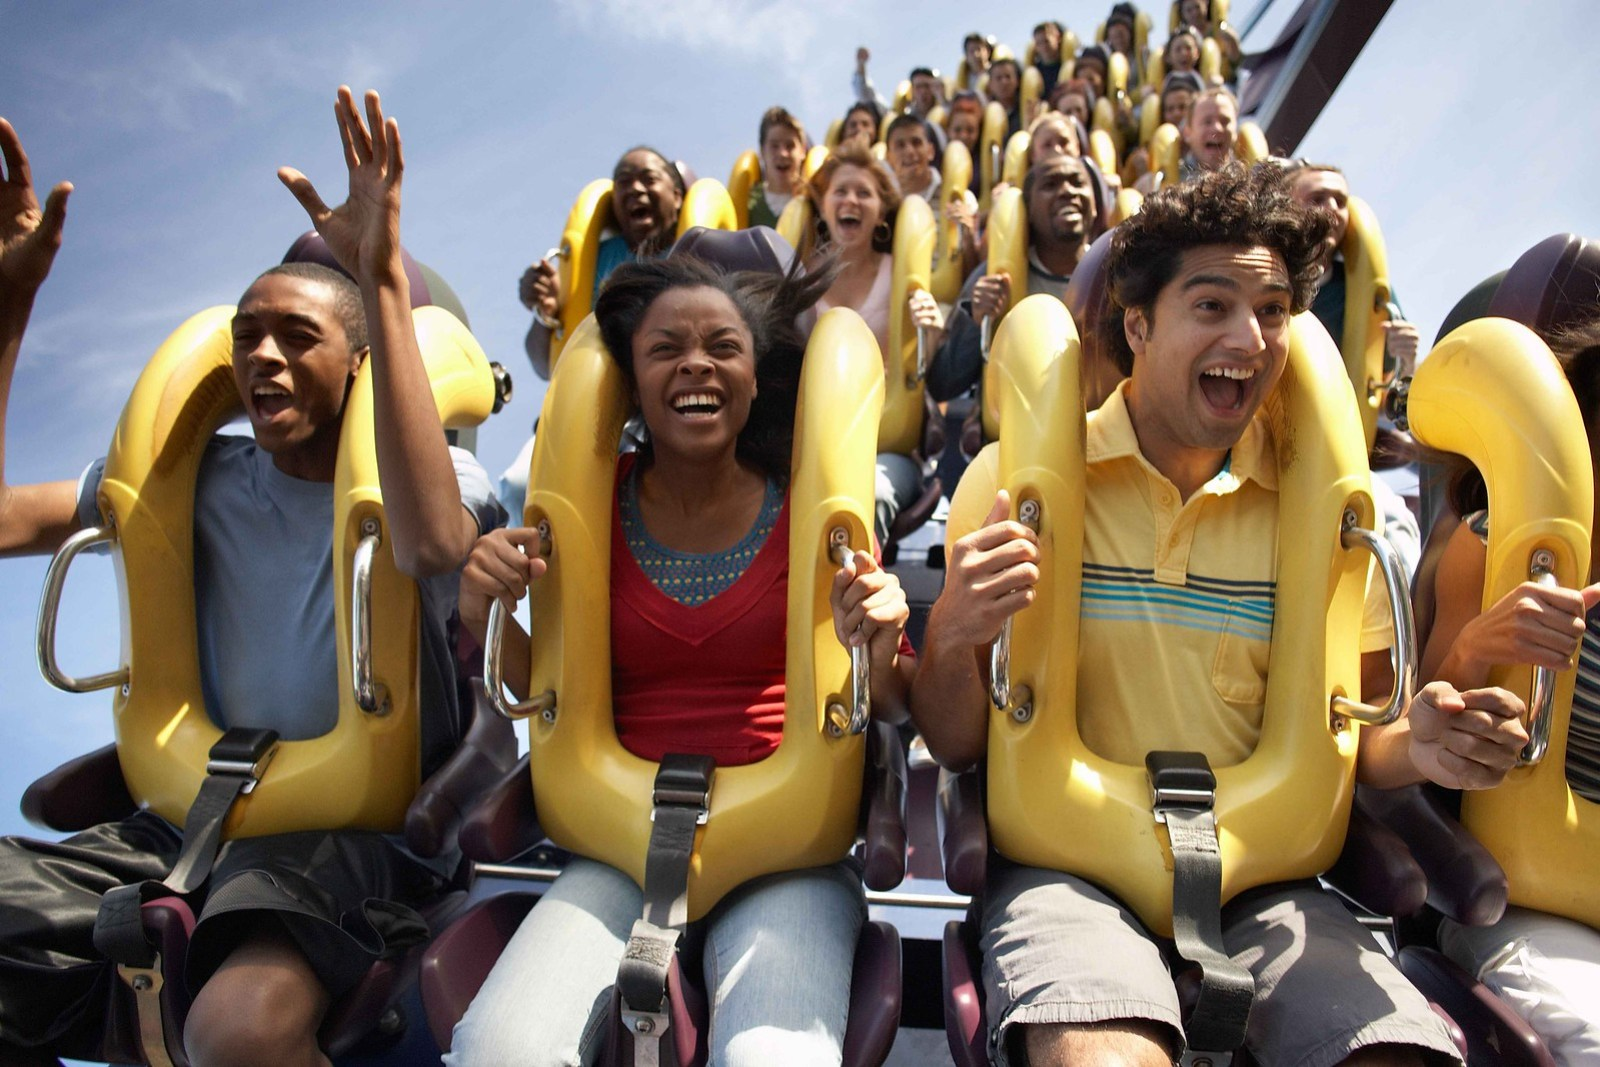 Batman Rollercoaster, Six Flags New England - Agawam